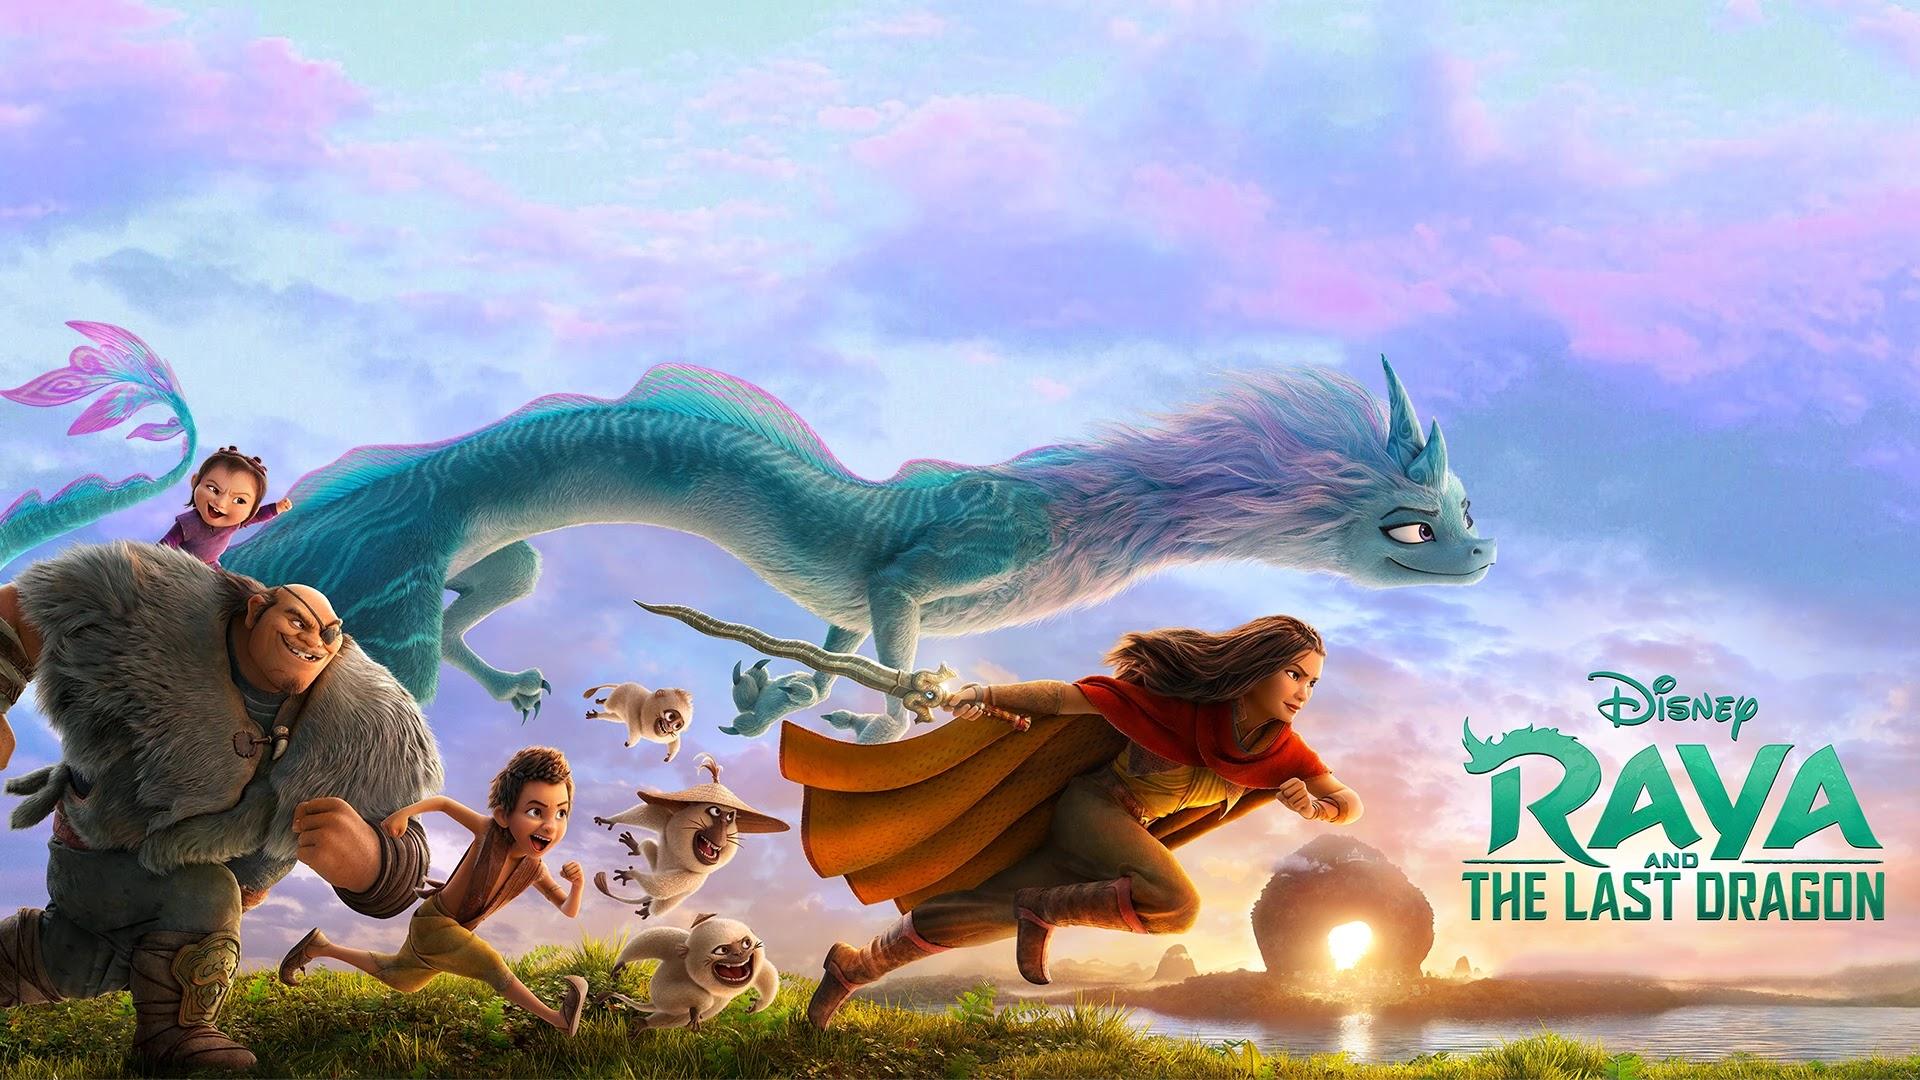 Raya and the Last Dragon Wallpaper